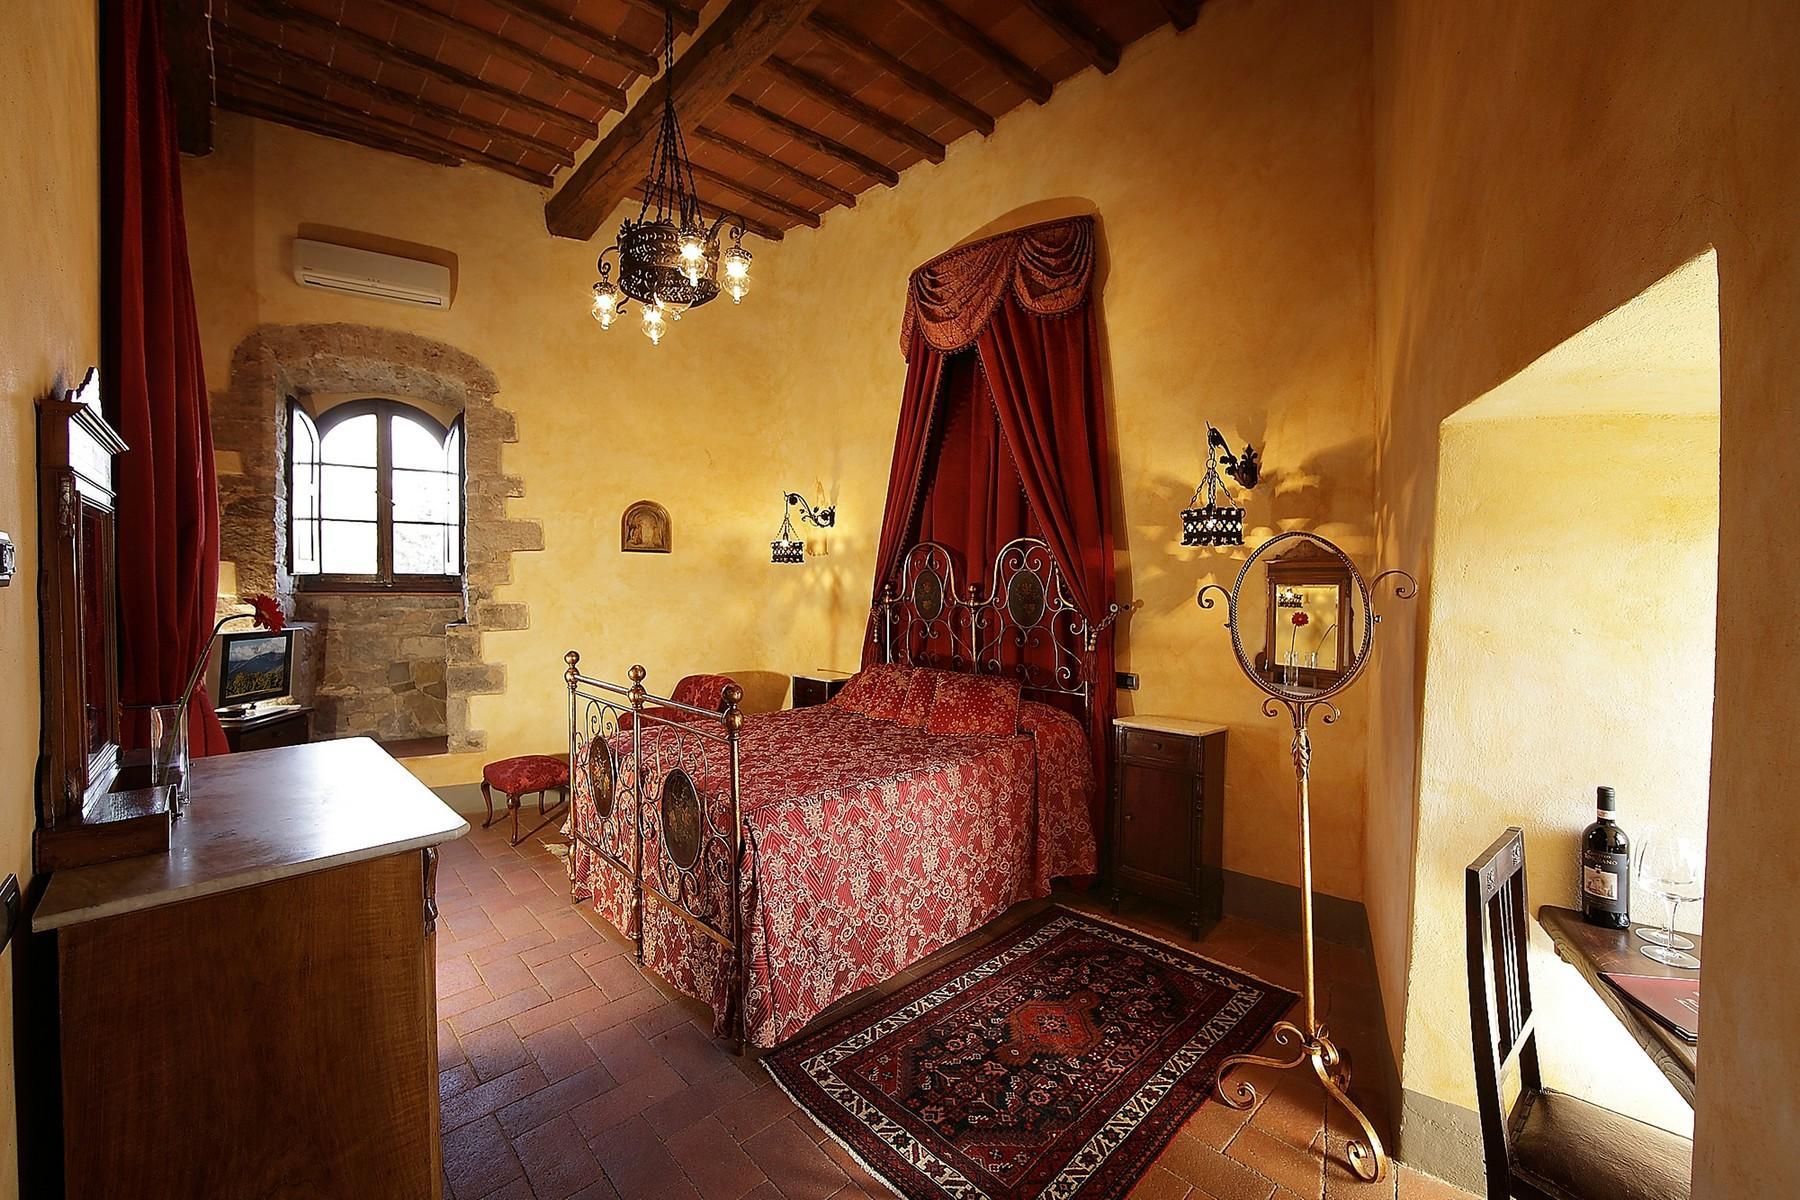 Exclusive manor in the heart of Chianti Classico - 13